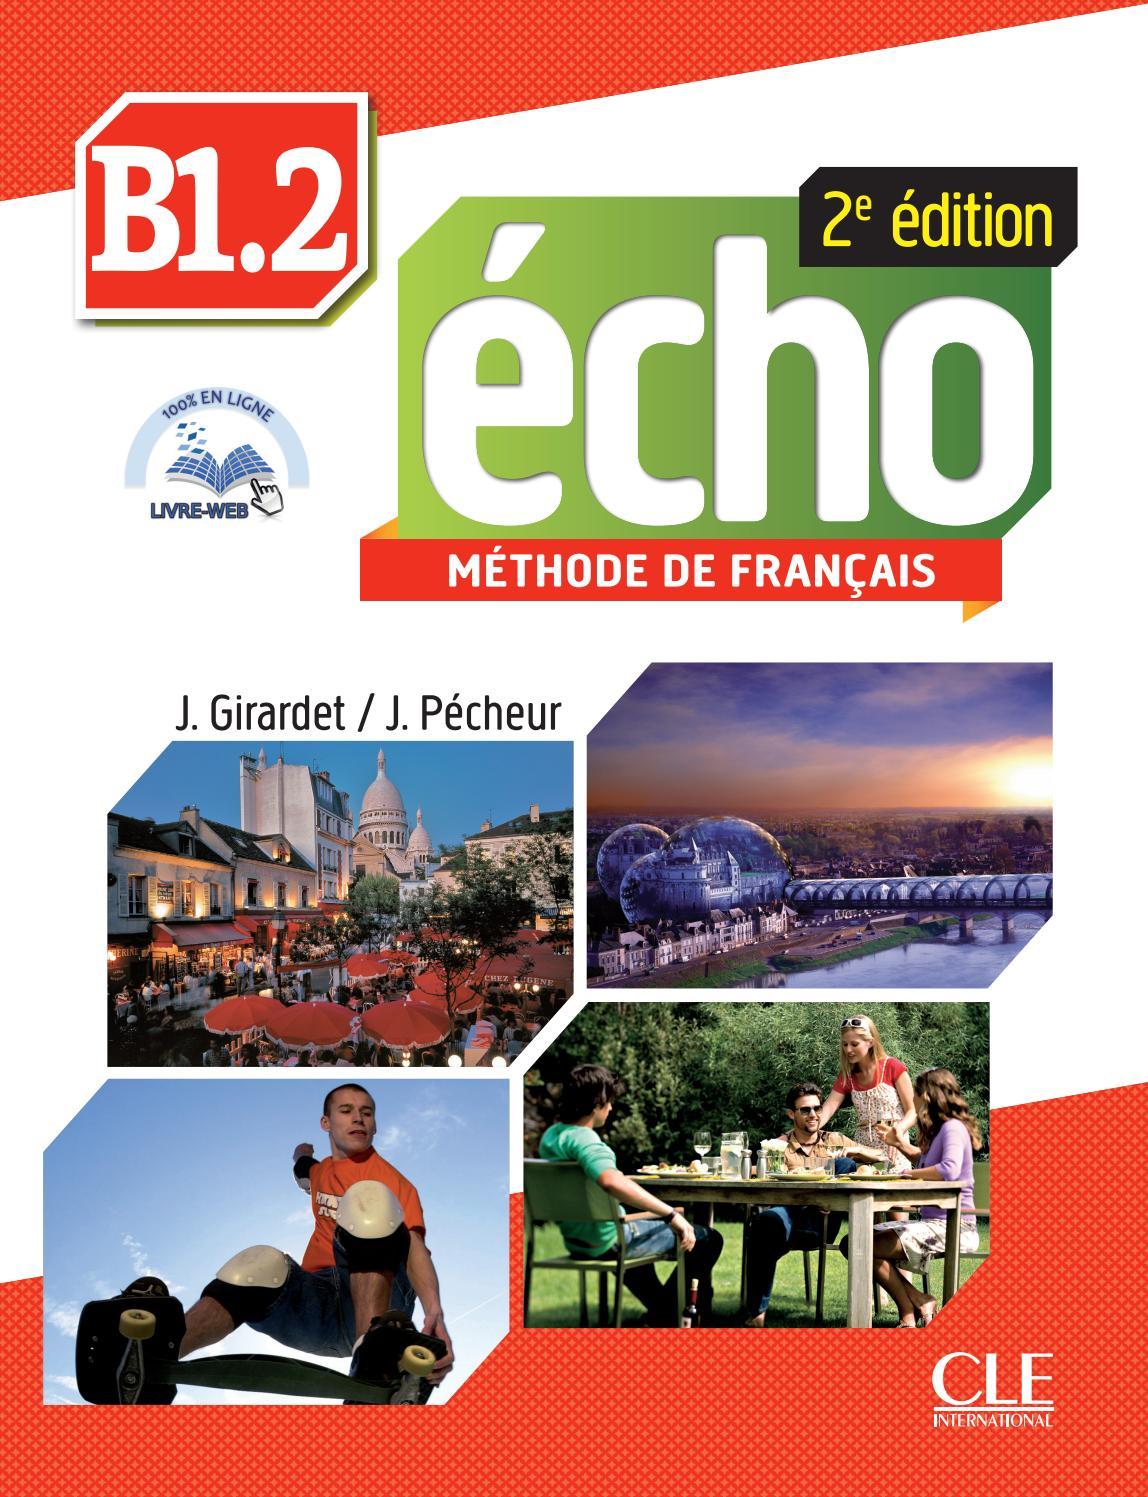 a440a6d36e1b62 Extrait d Echo B1.2 by CLE International - issuu